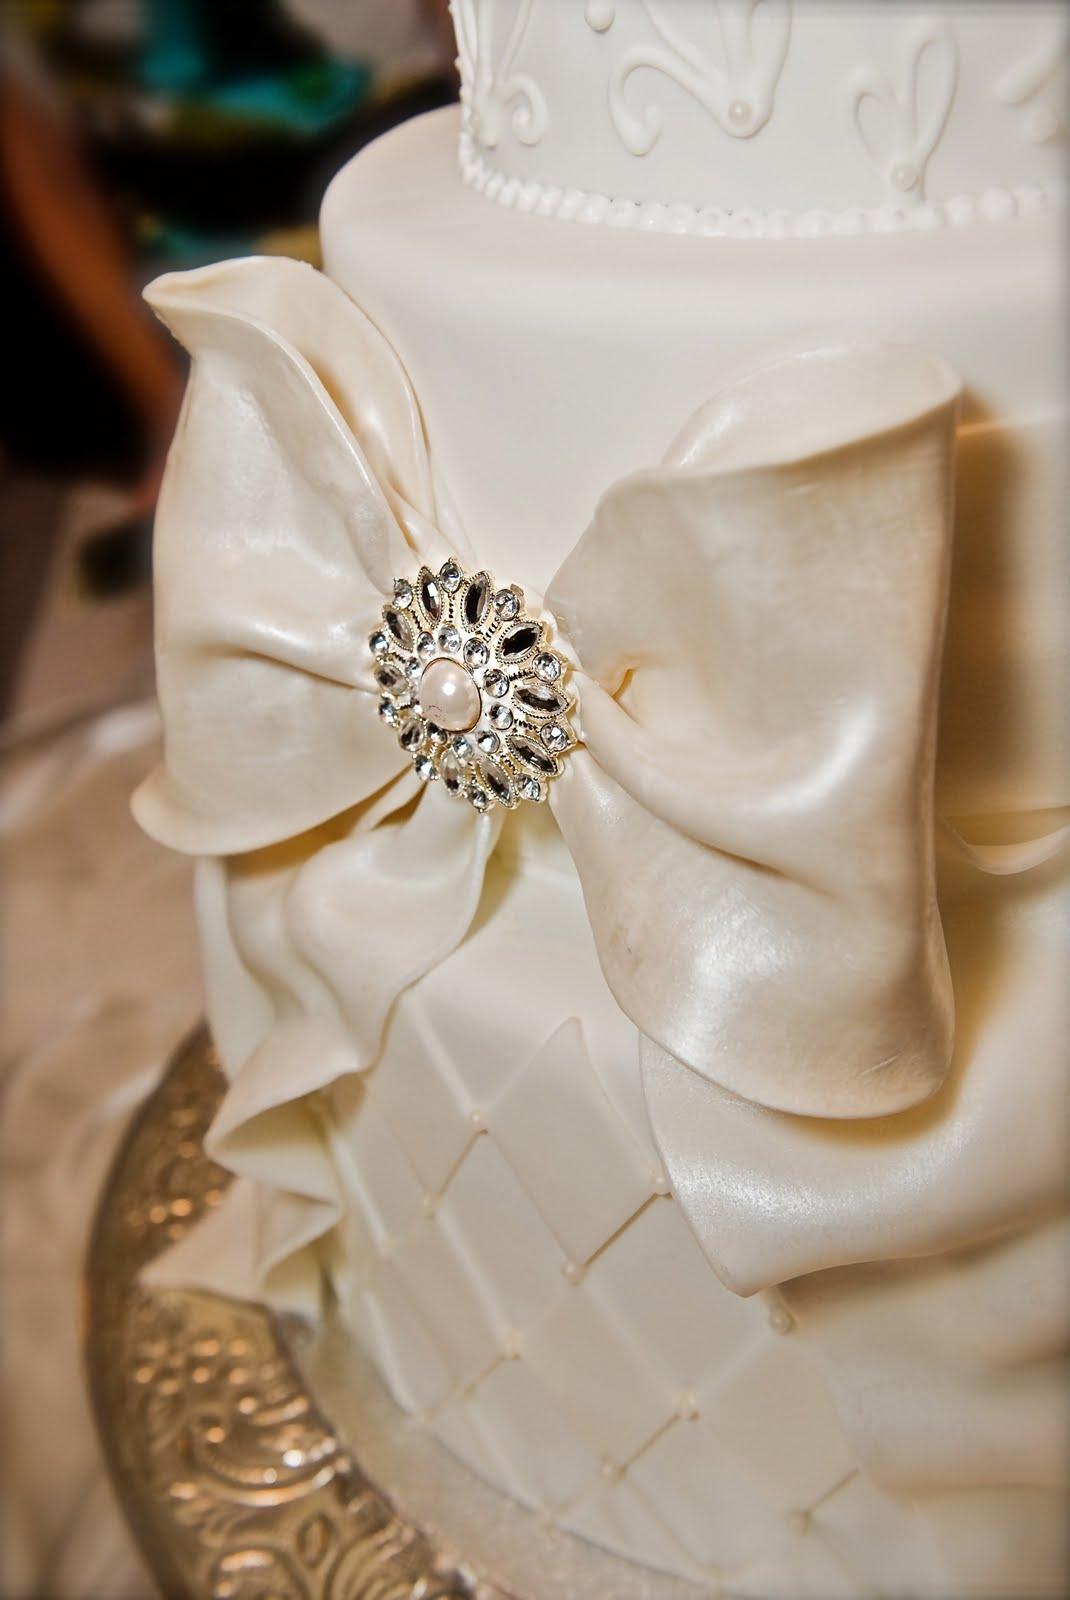 The Good Apple: Big Bow Wedding Cake